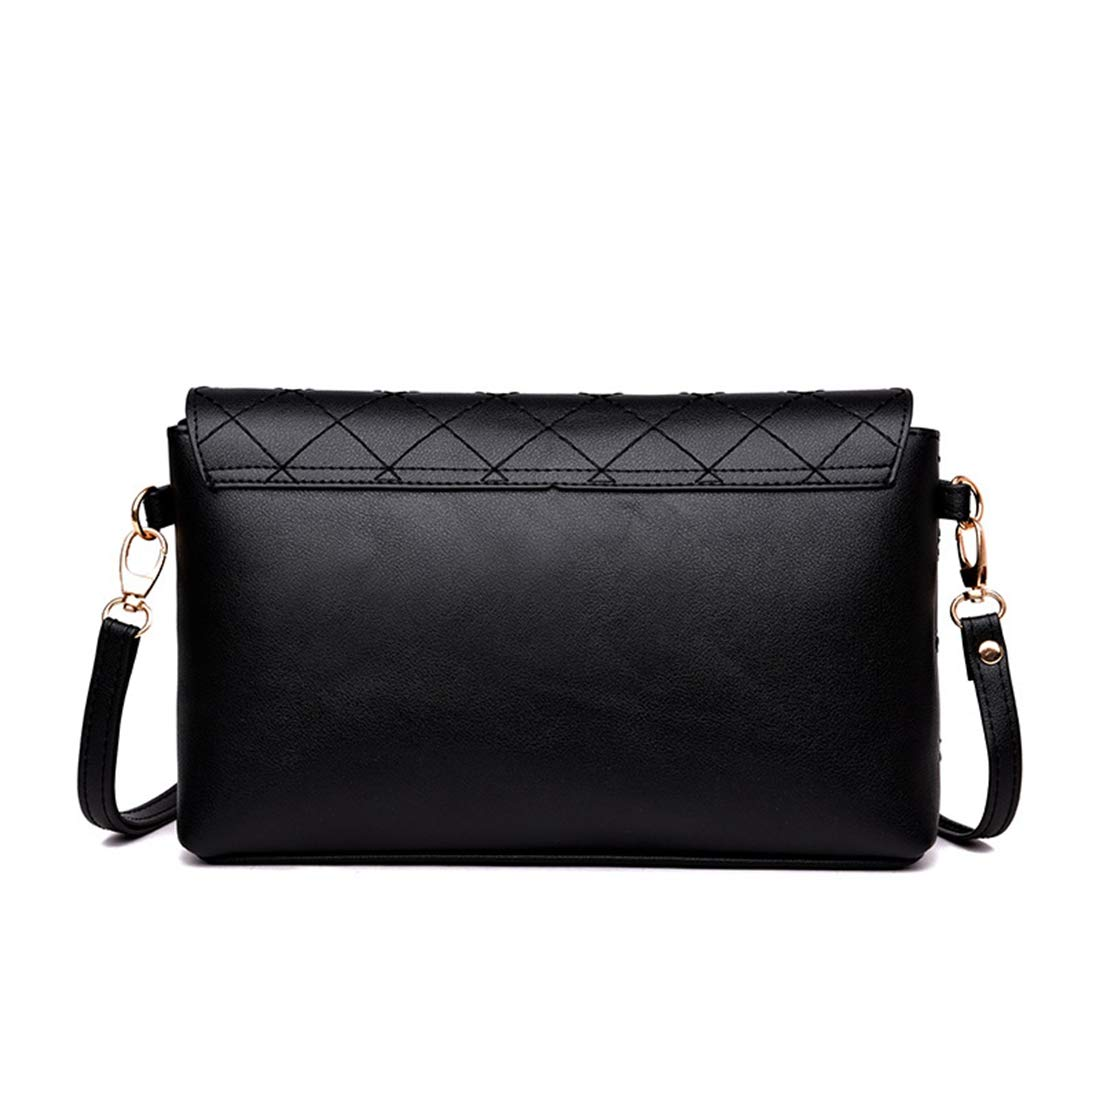 AIYAMAYA Womens Elegant PU Leather Embroidery Fanny Pack Cute Waist Pouch Stylish Travel Cell Phone Bag